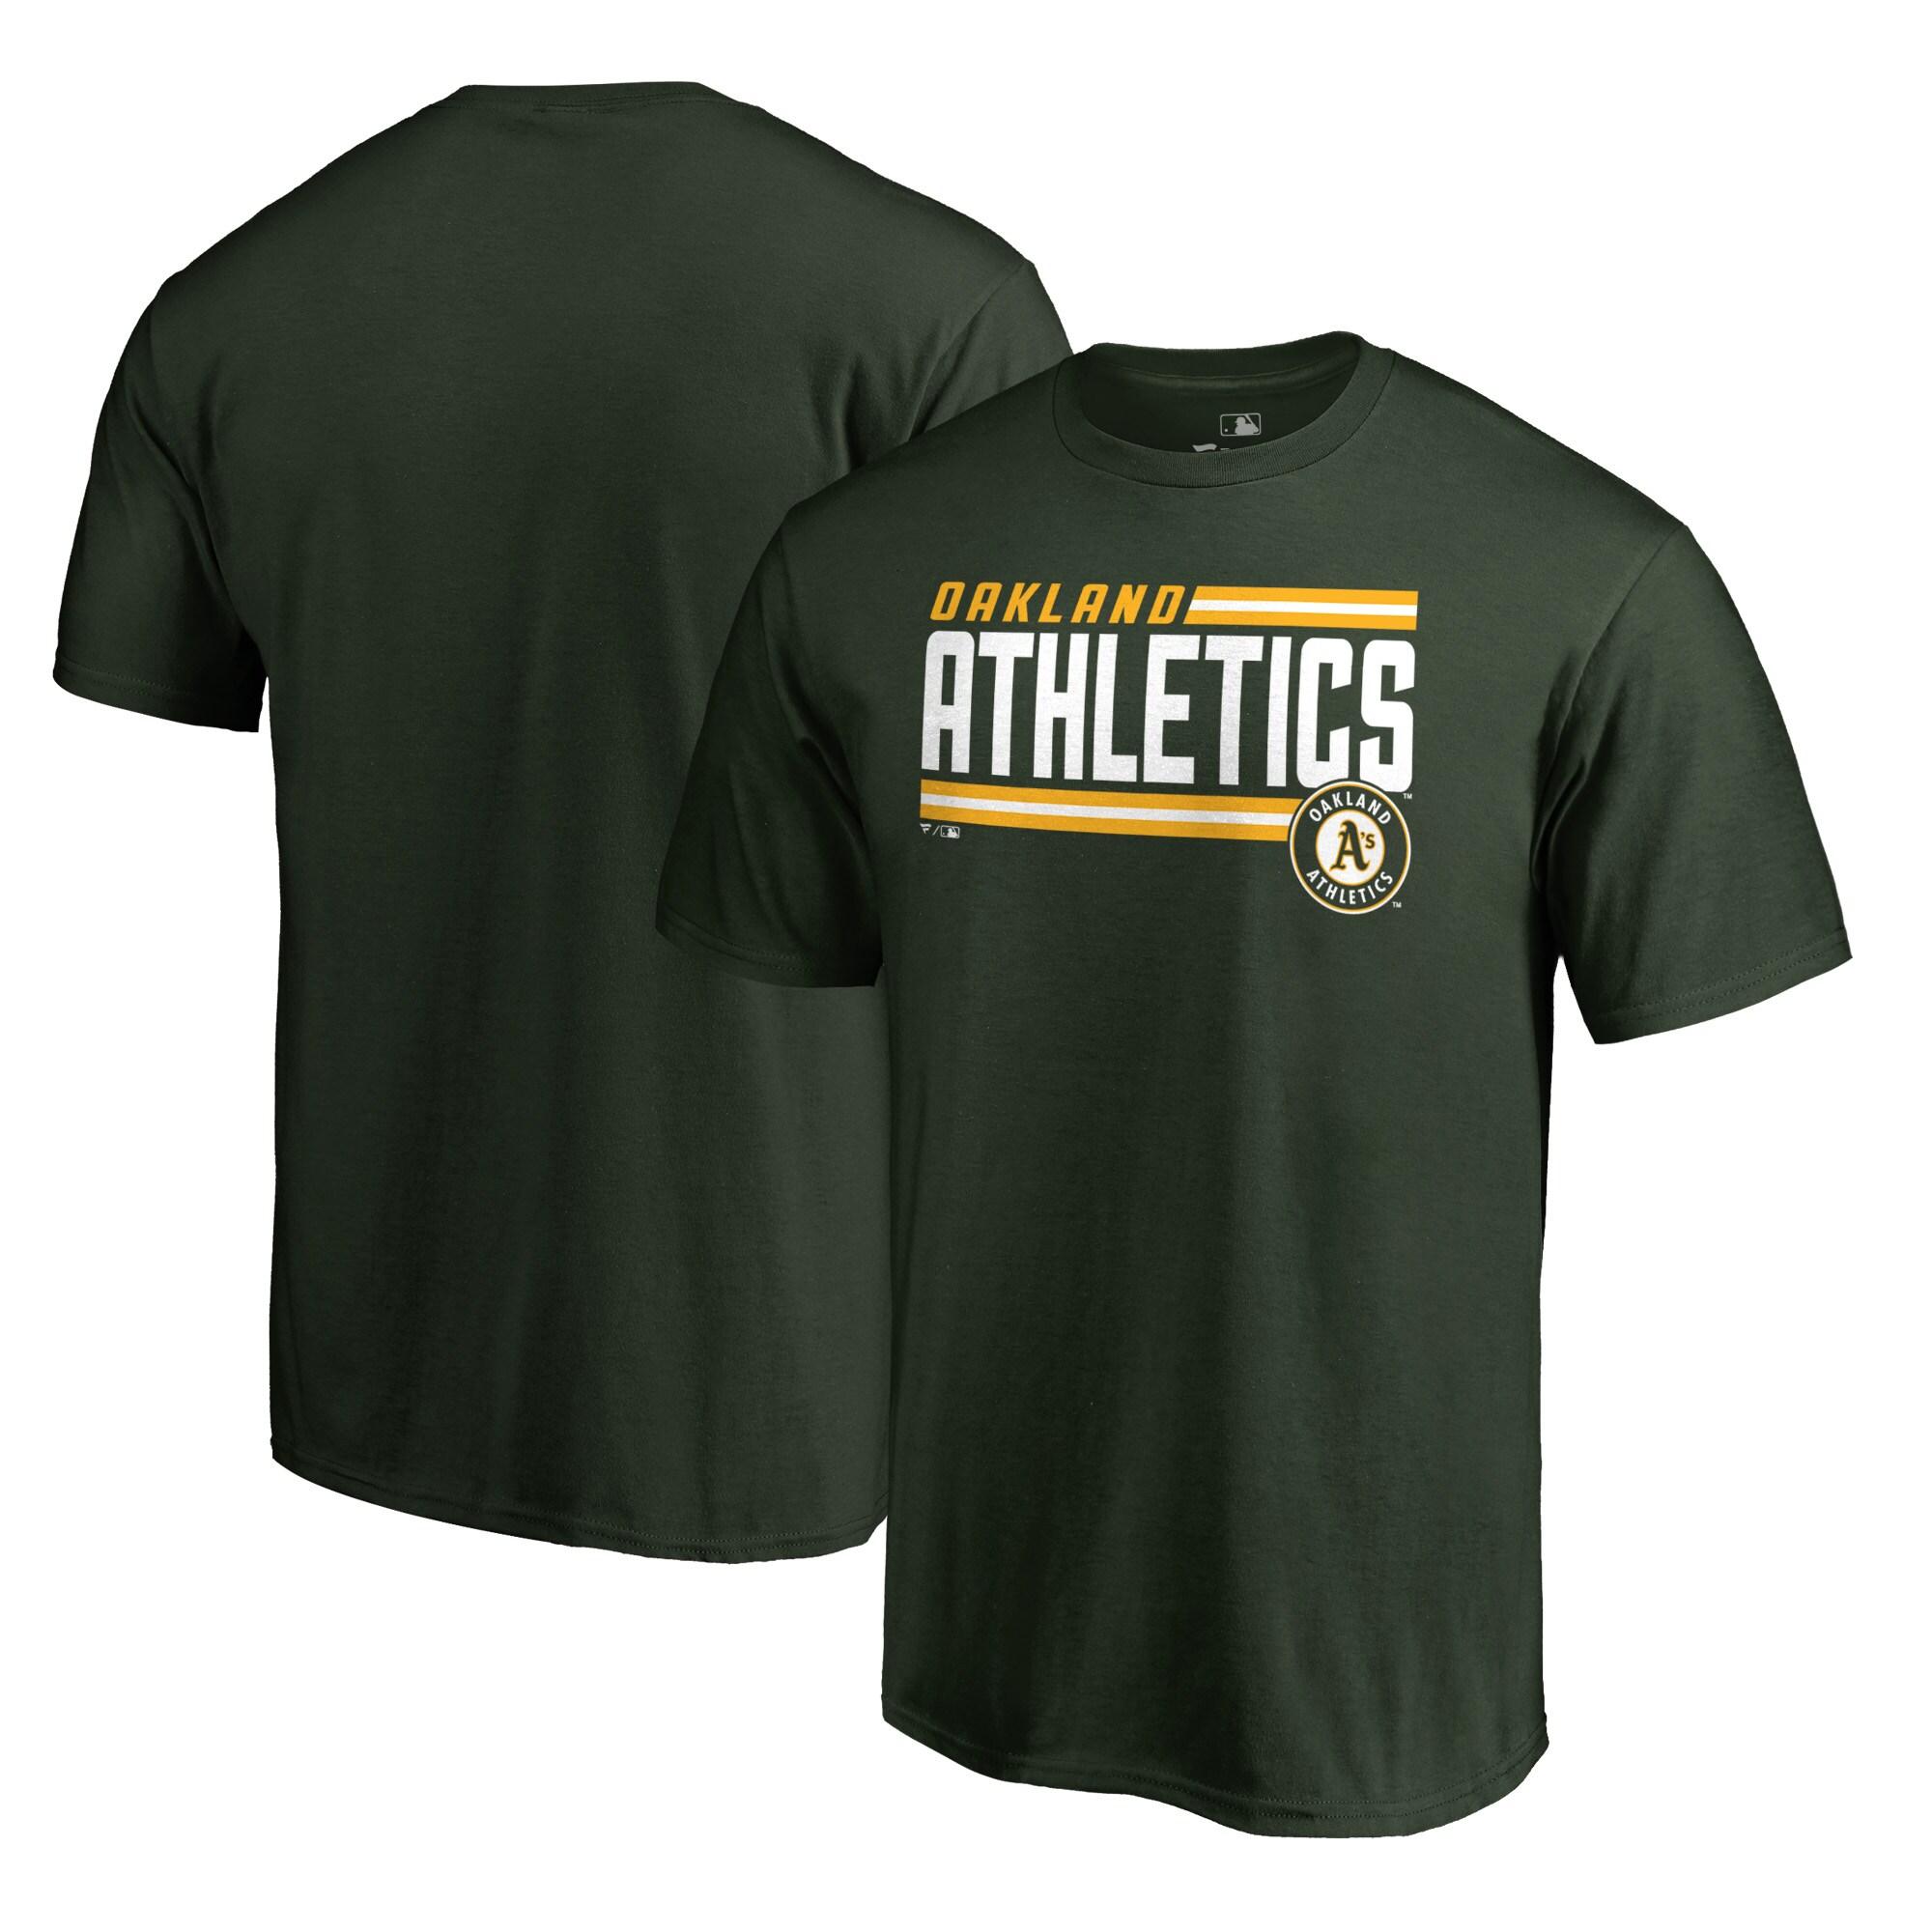 Oakland Athletics Fanatics Branded Onside Stripe T-Shirt - Green